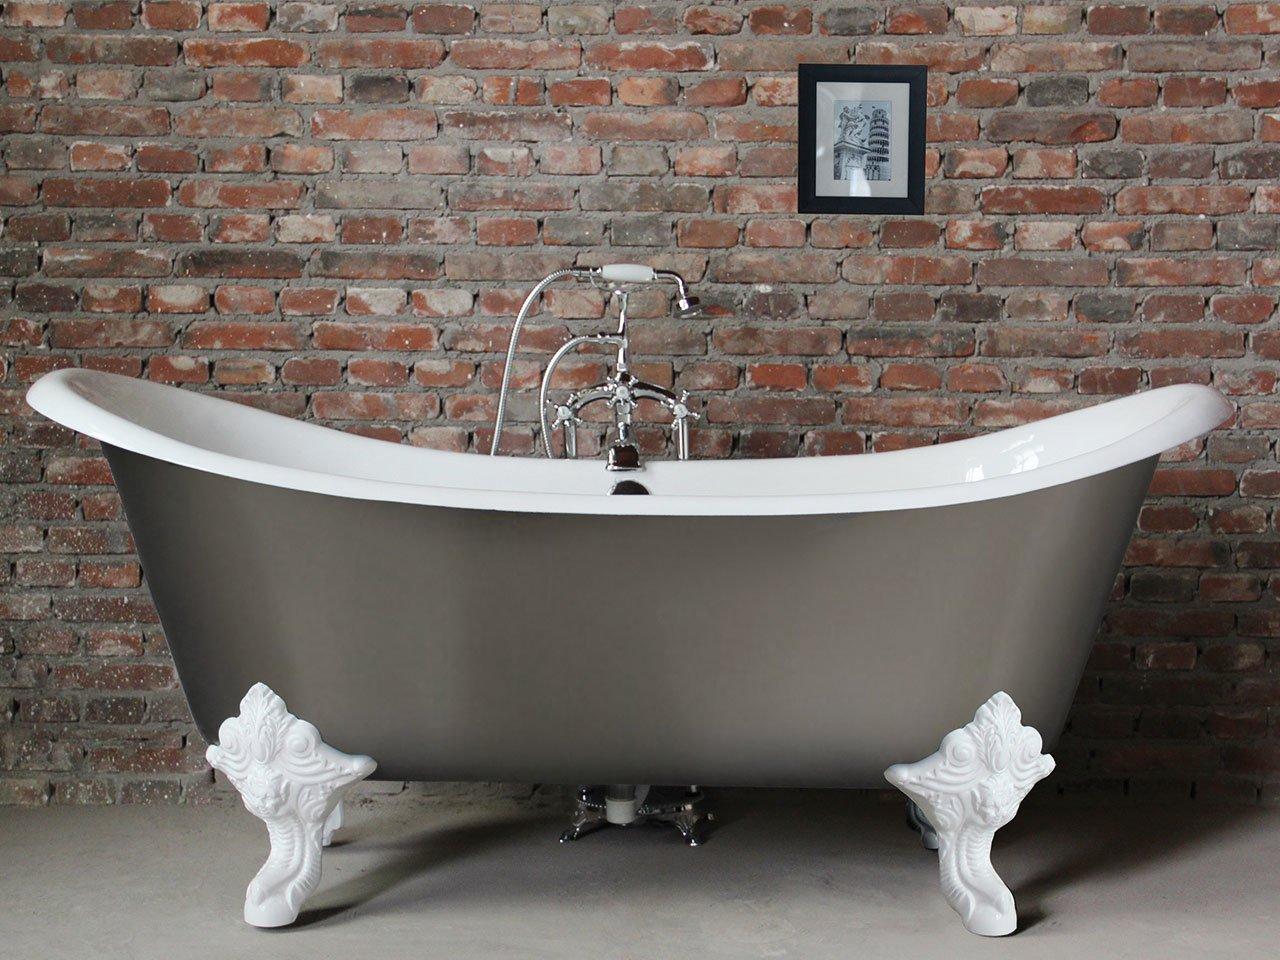 Vasca Da Bagno Freestanding Prezzo : Vasche da bagno ovali archiproducts